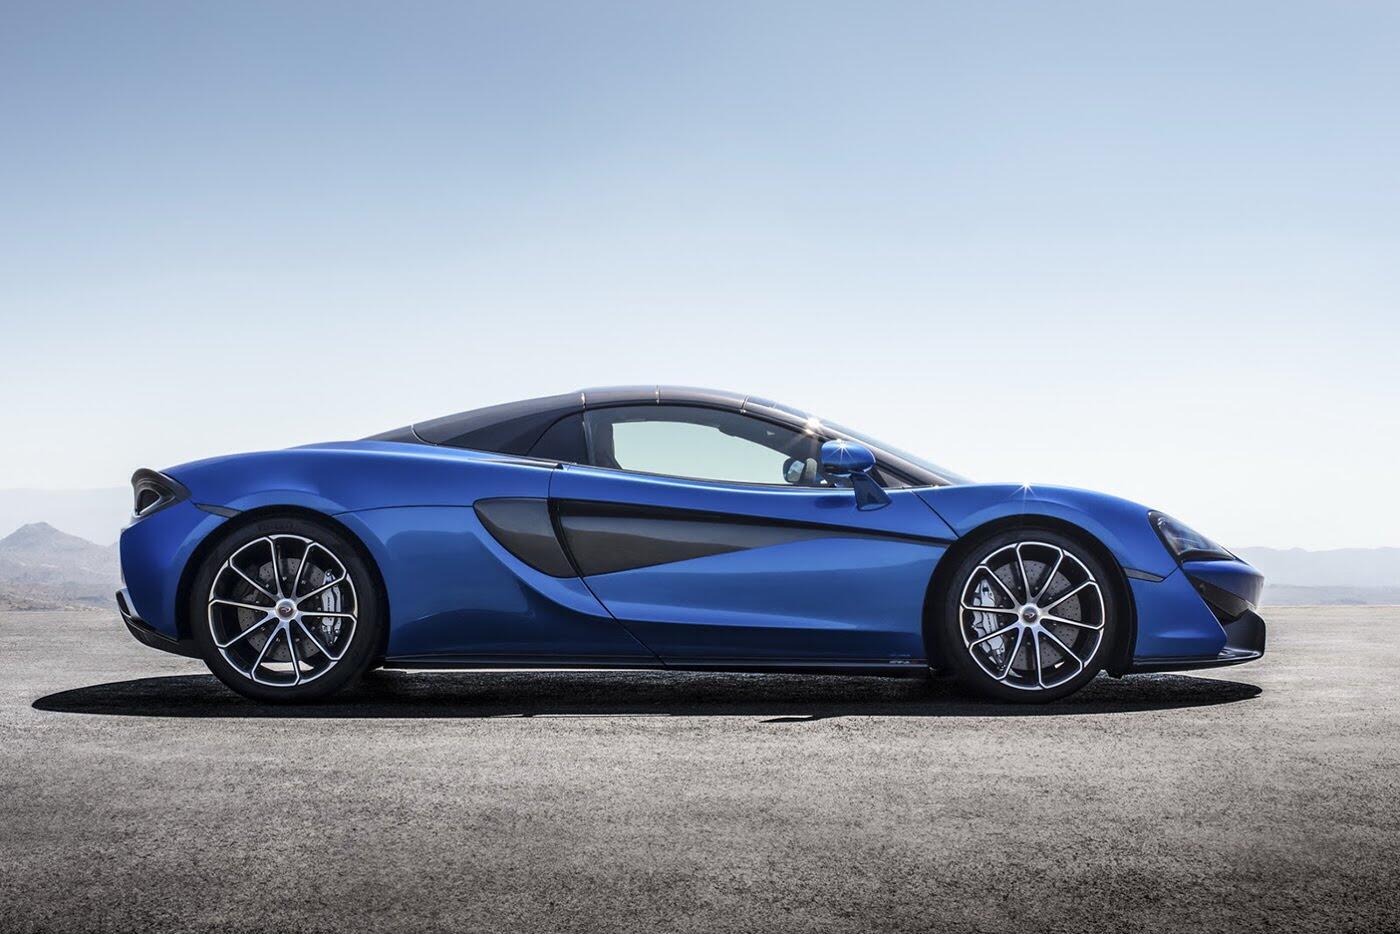 Siêu xe McLaren 570S Spider sắp ra mắt - Hình 2